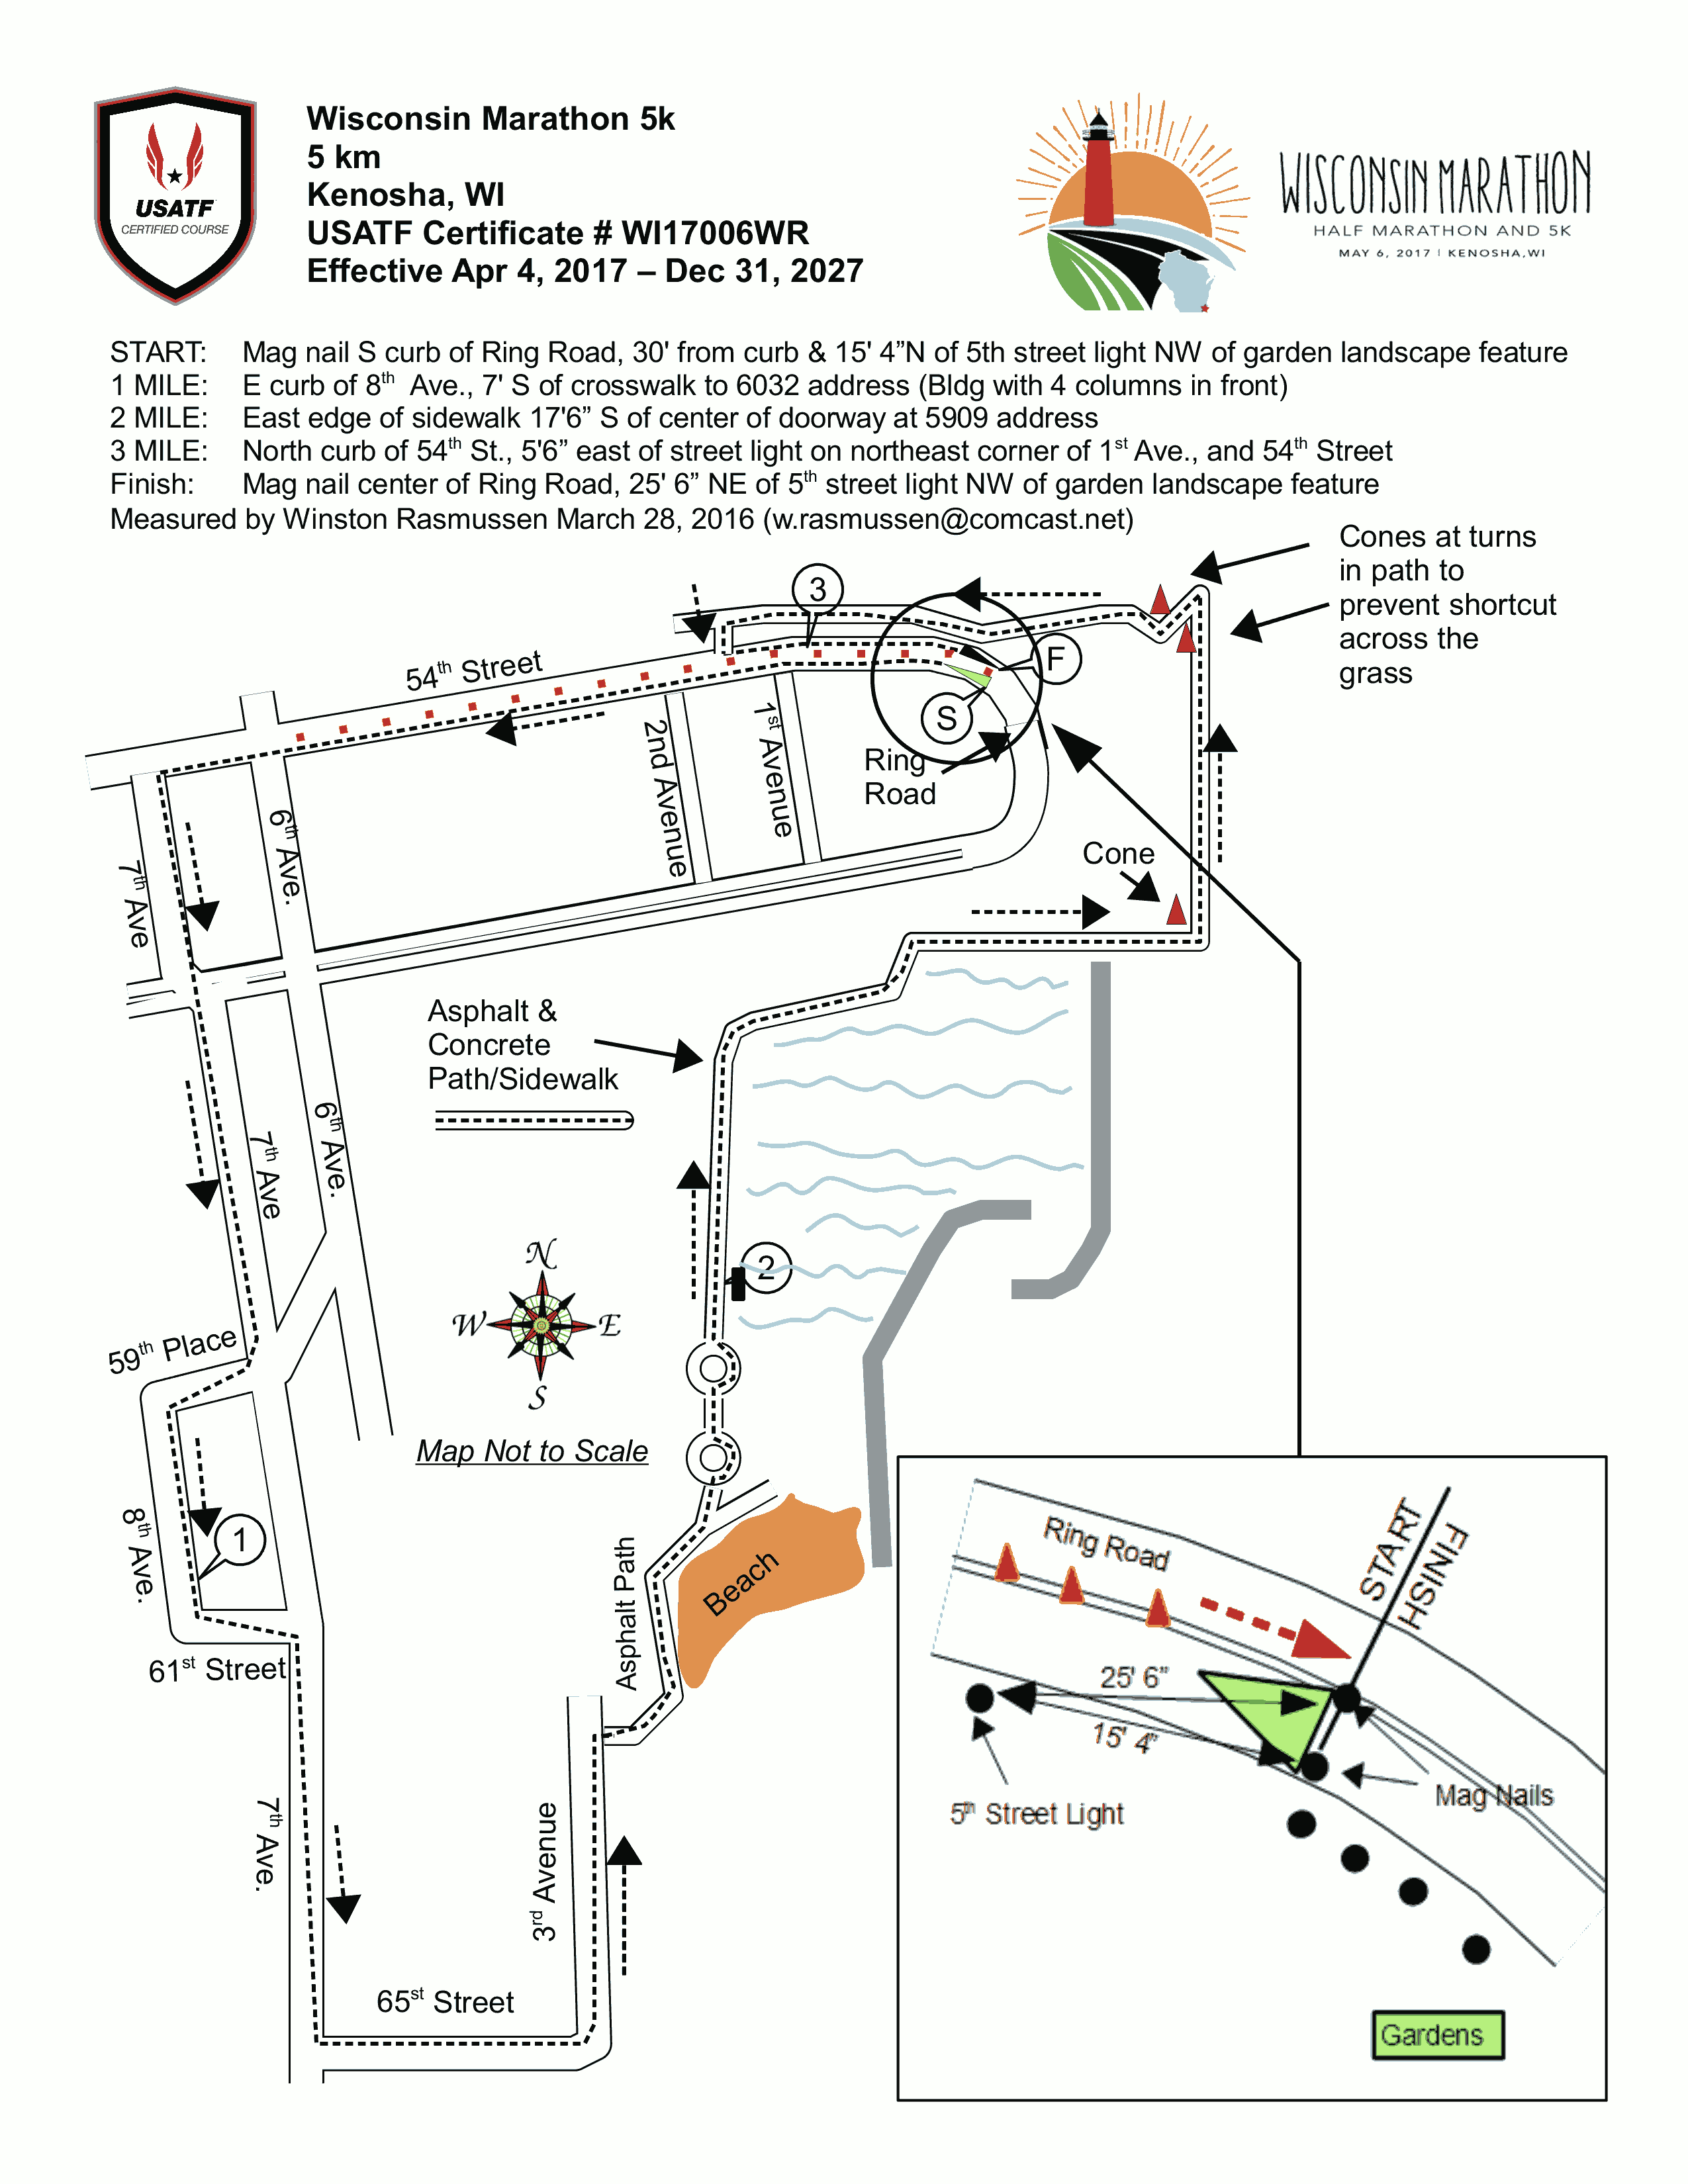 Course Description  Wisconsin Marathon - Chicago marathon map